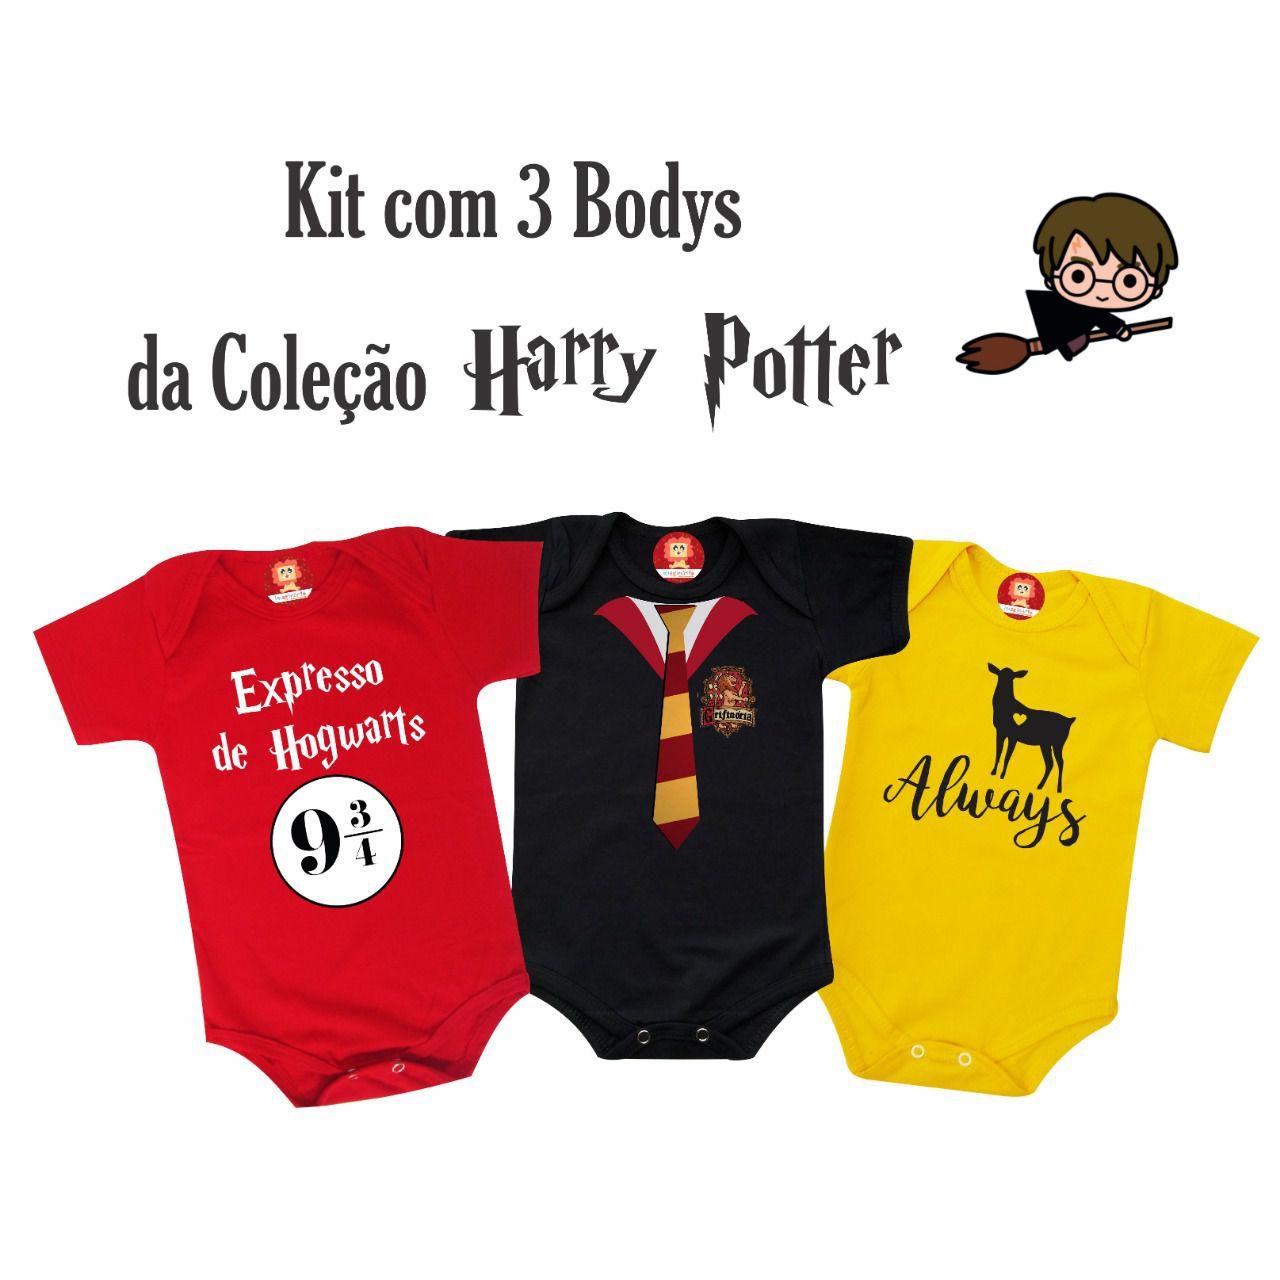 Combo 3 Roupinhas Harry Potter Grifinória Expresso Hogwarts Always